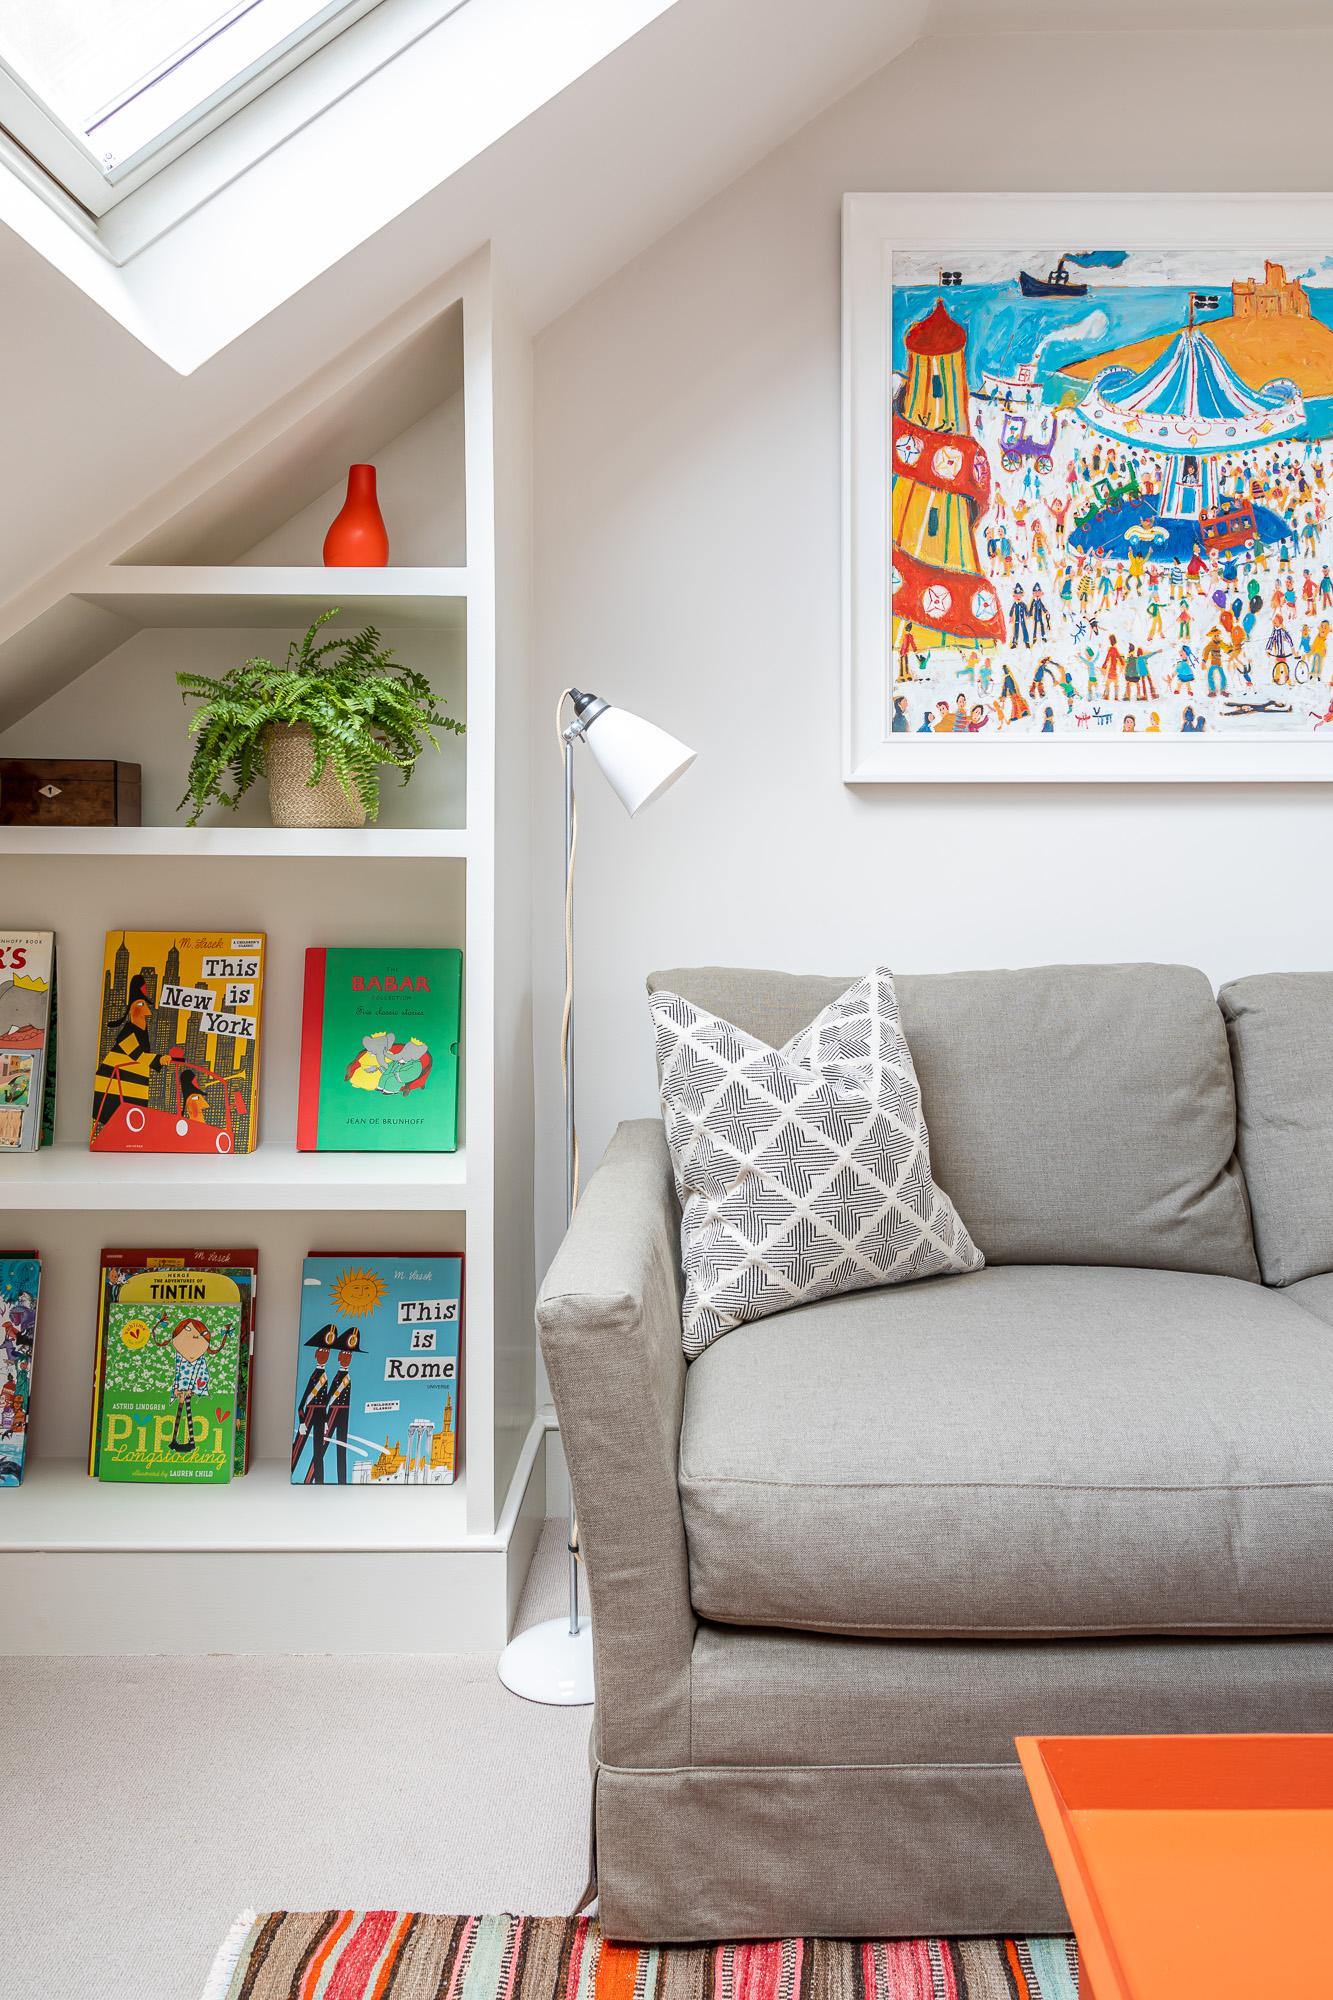 jonathan bond, floor lamp & sofa, clapham, london